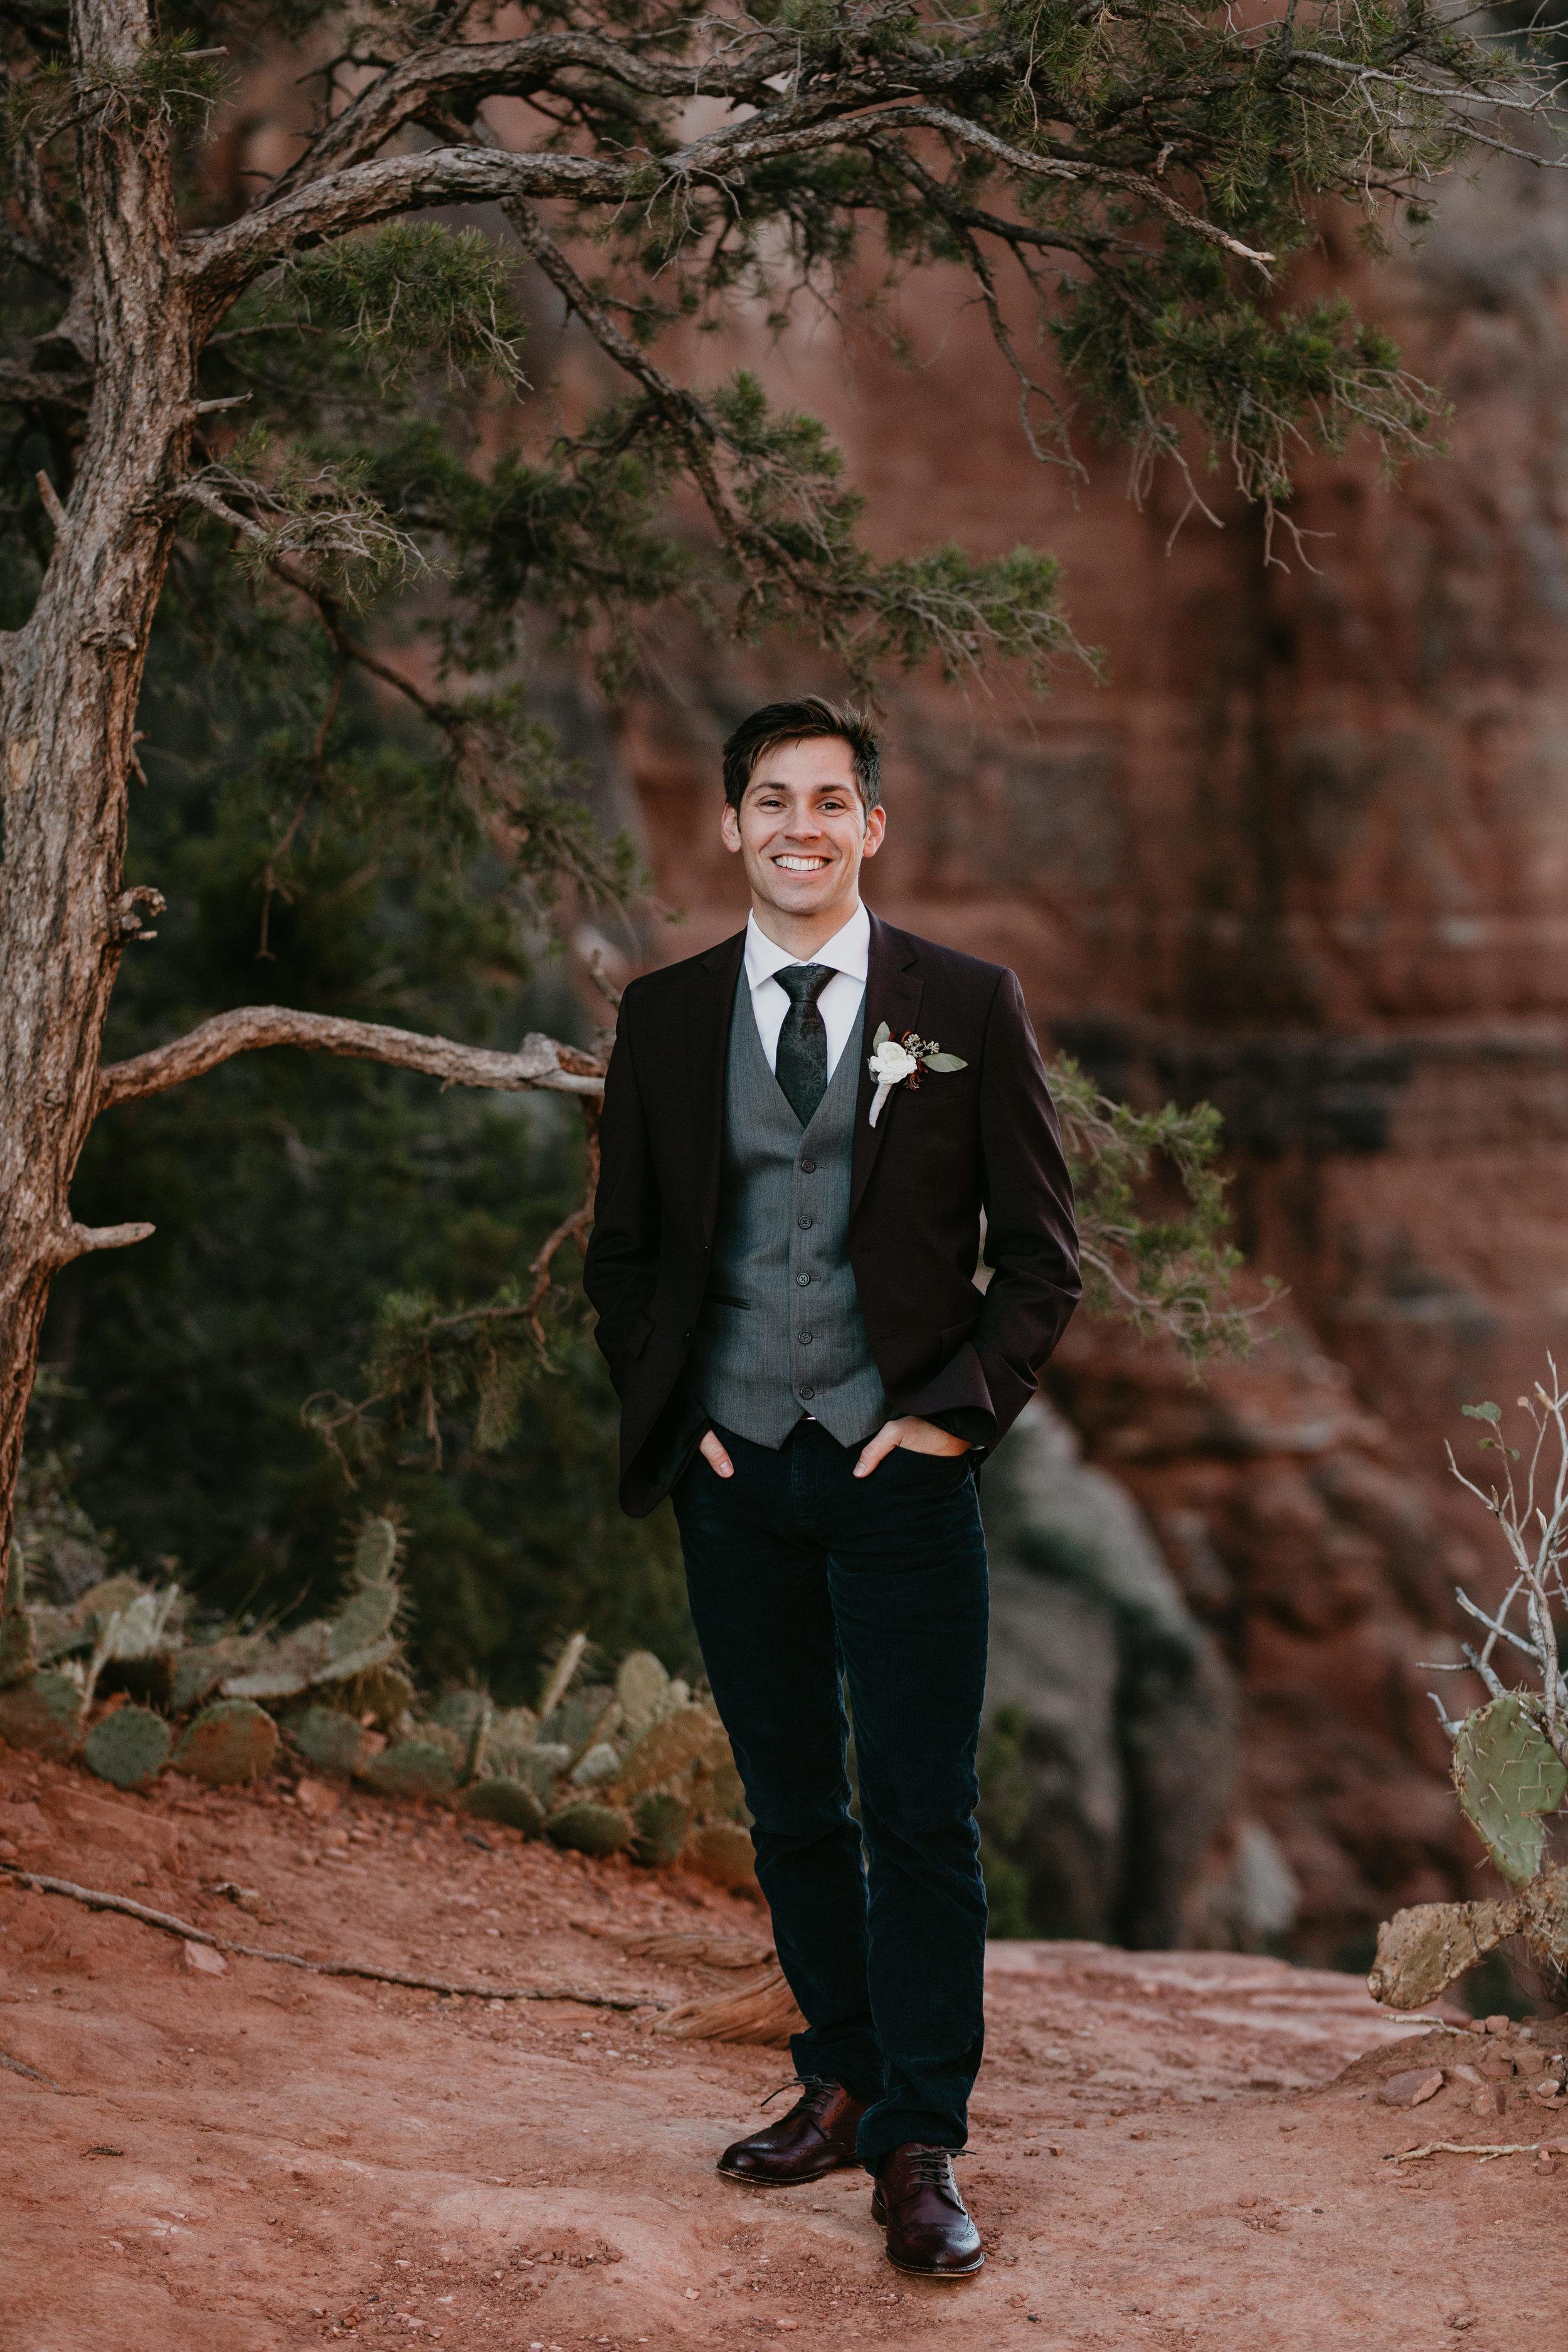 nicole-daacke-photography-sedona-arizona-destination-elopement-wedding-photographer-catherdral-rock-hiking-elopement-sedona-river-elopement-photos-desert-rock-wedding-photographer-laid-back-spontaneous-elopement-61.jpg